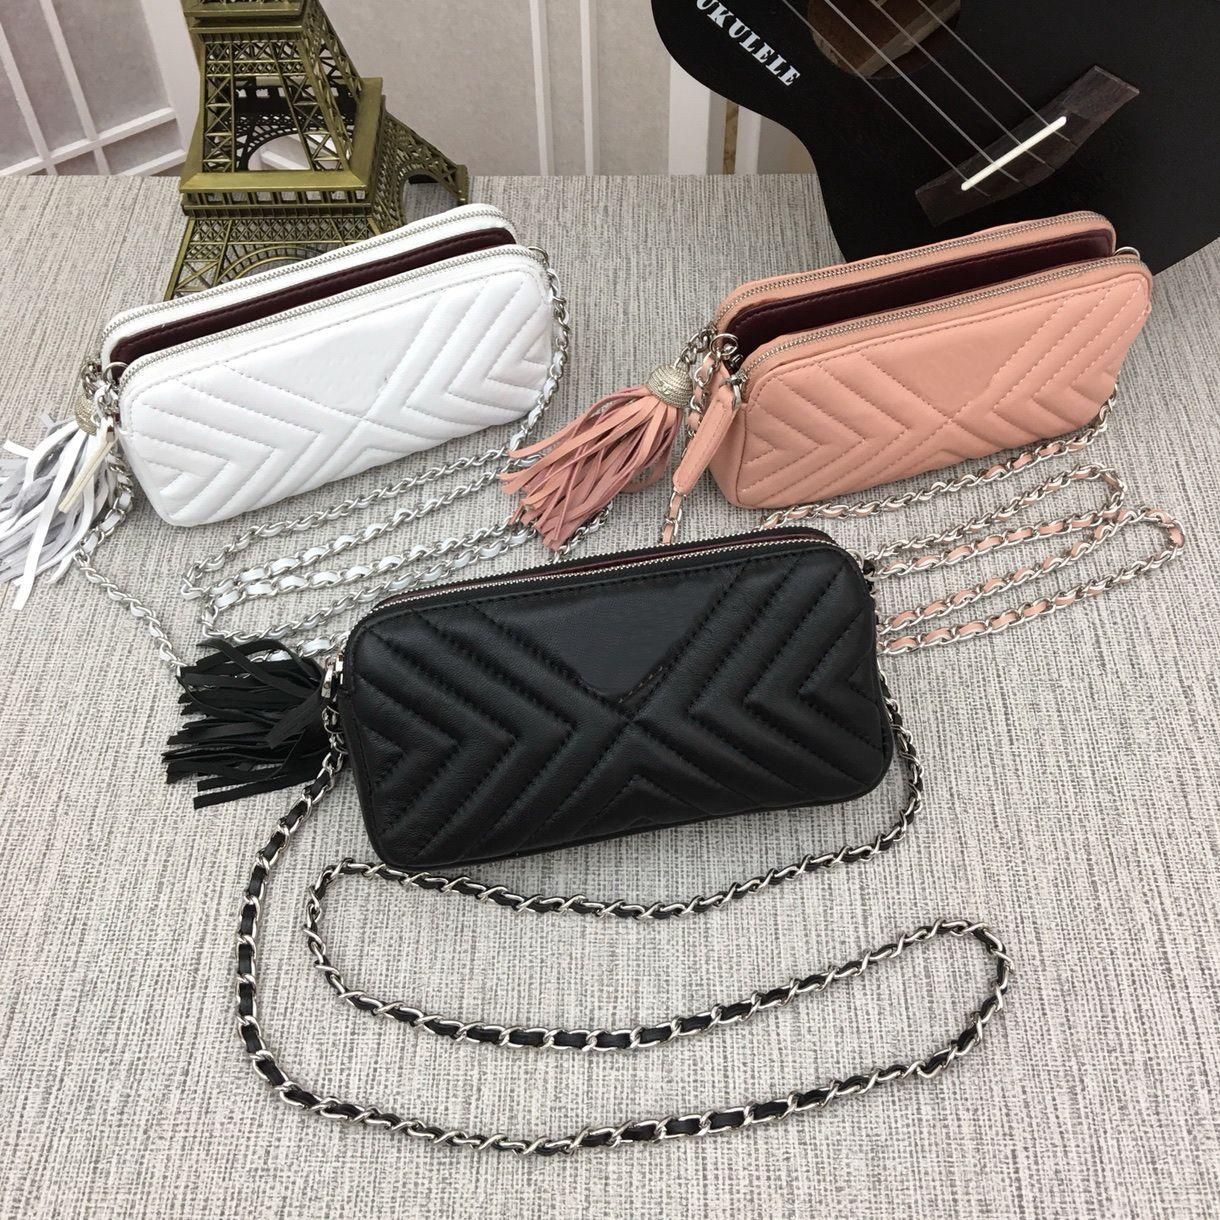 Women's handbags Genuine Leather Lambskin 8032A Shoulder Bags Le Boy Flaps V Silver chain Have dust bag 231 Wallets